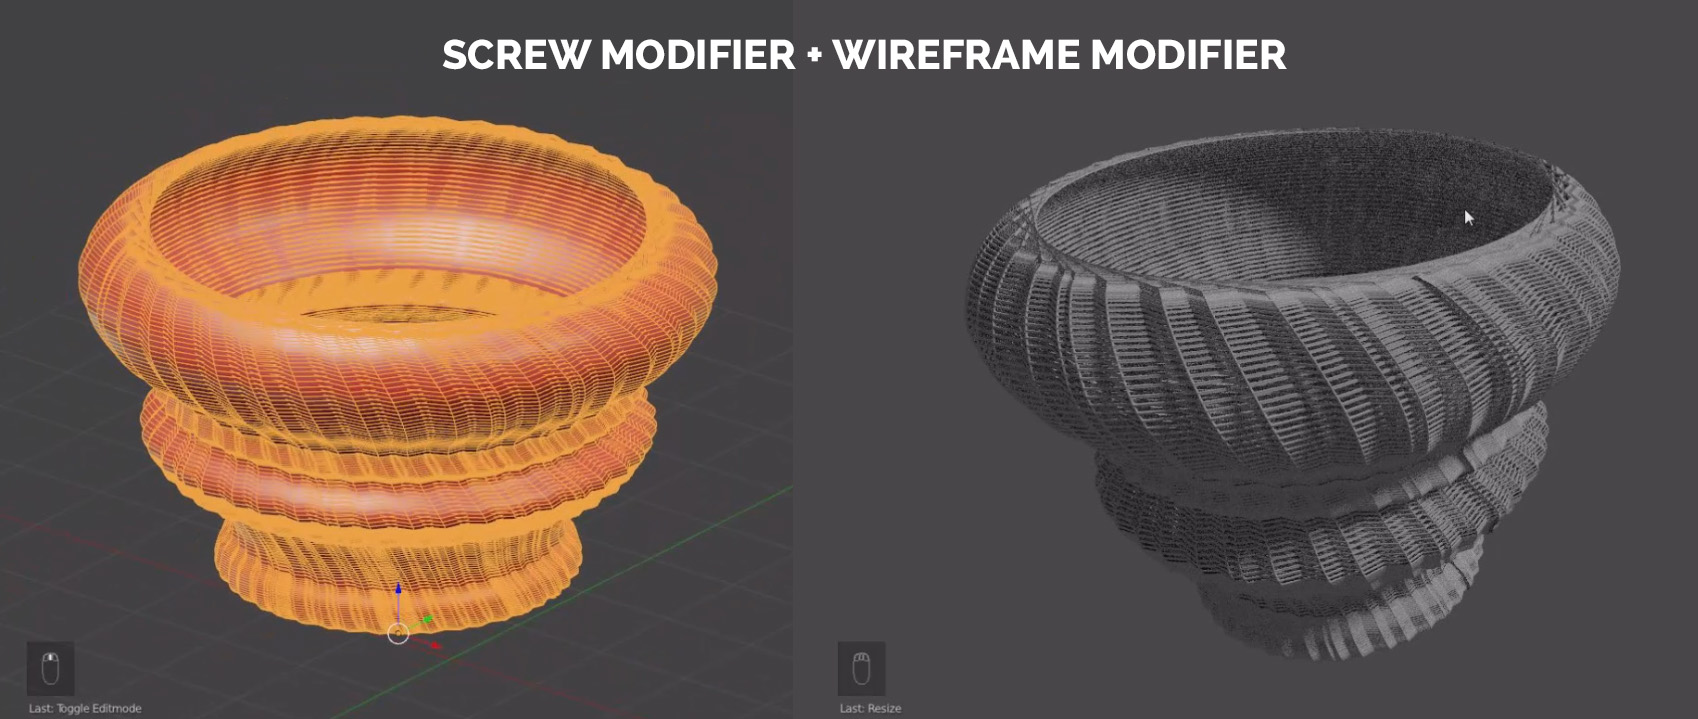 blender screw modifier wireframe